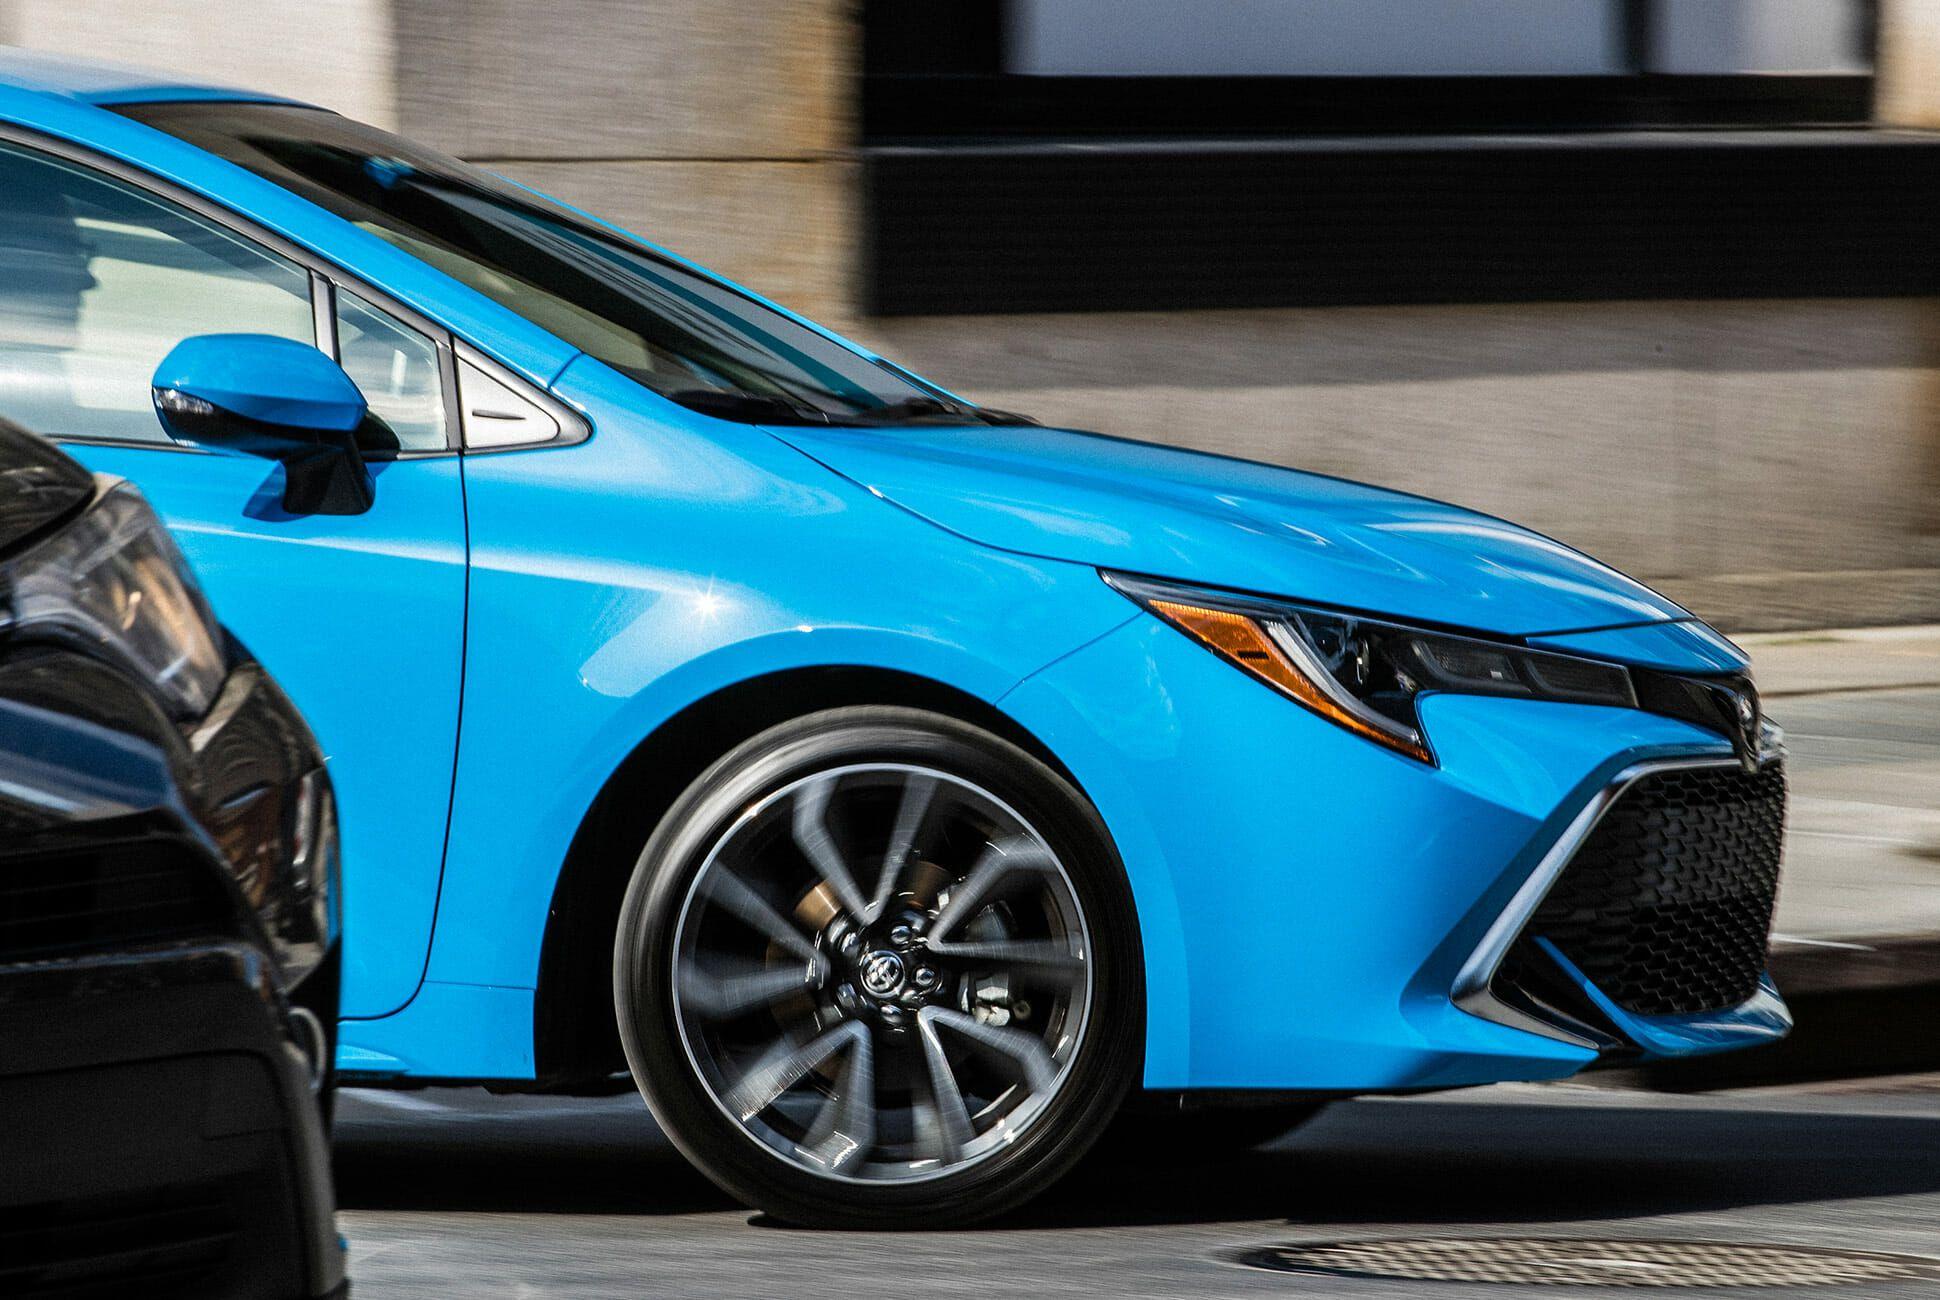 Toyota-Corolla-XSE-Hatch-Review-gear-patrol-slide-7